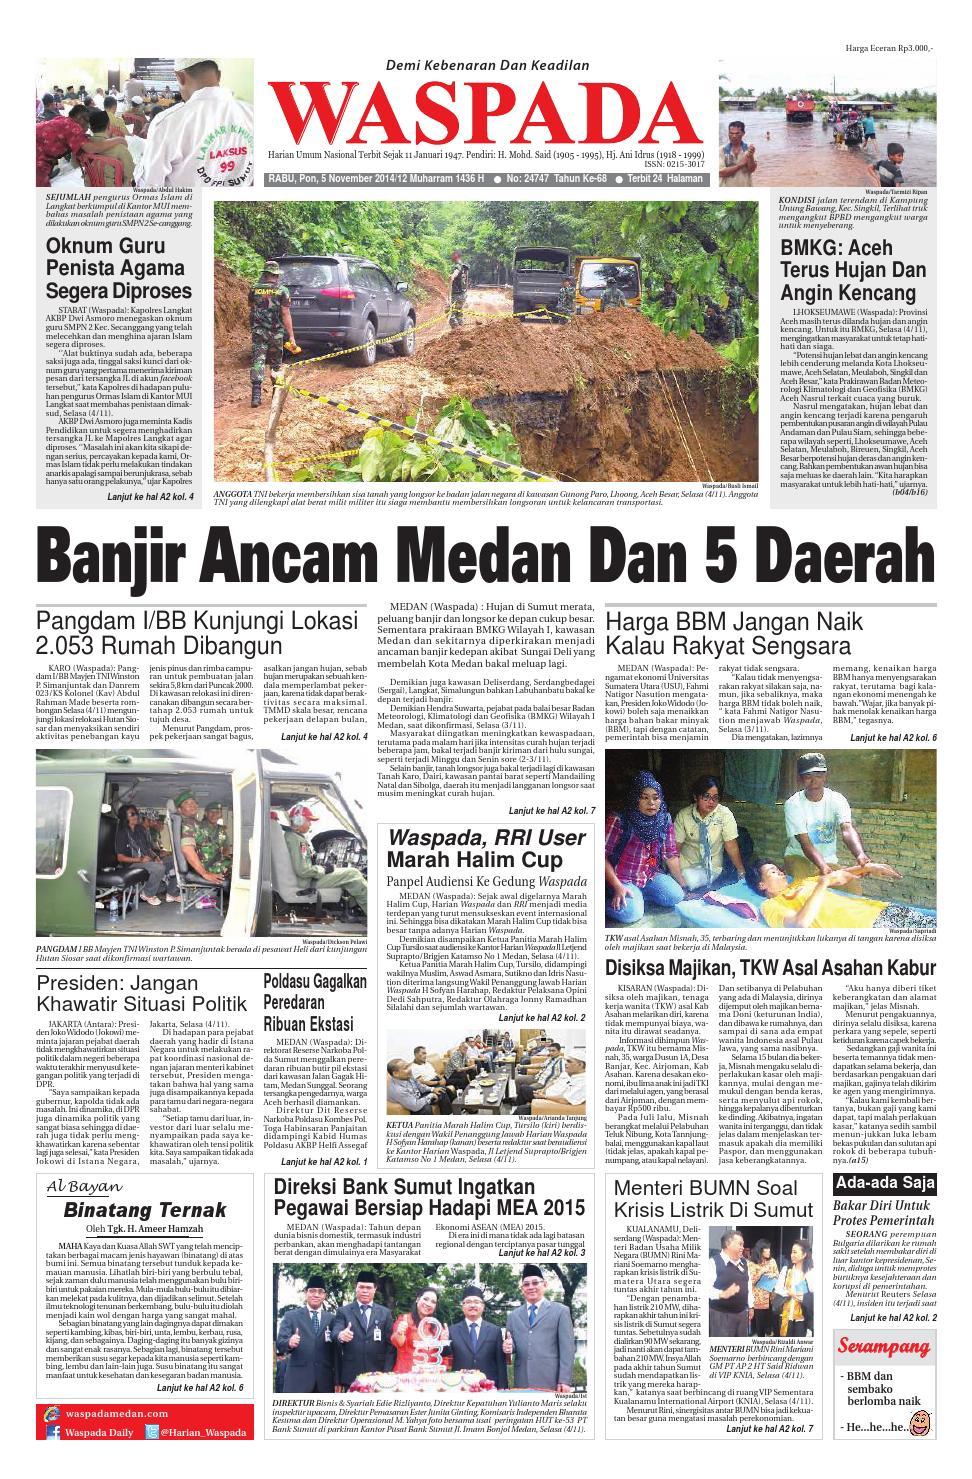 Waspada Rabu 5 November 2014 By Harian Issuu Produk Ukm Bumn Tenun Pagatan Kemeja Pria Biru Kapal